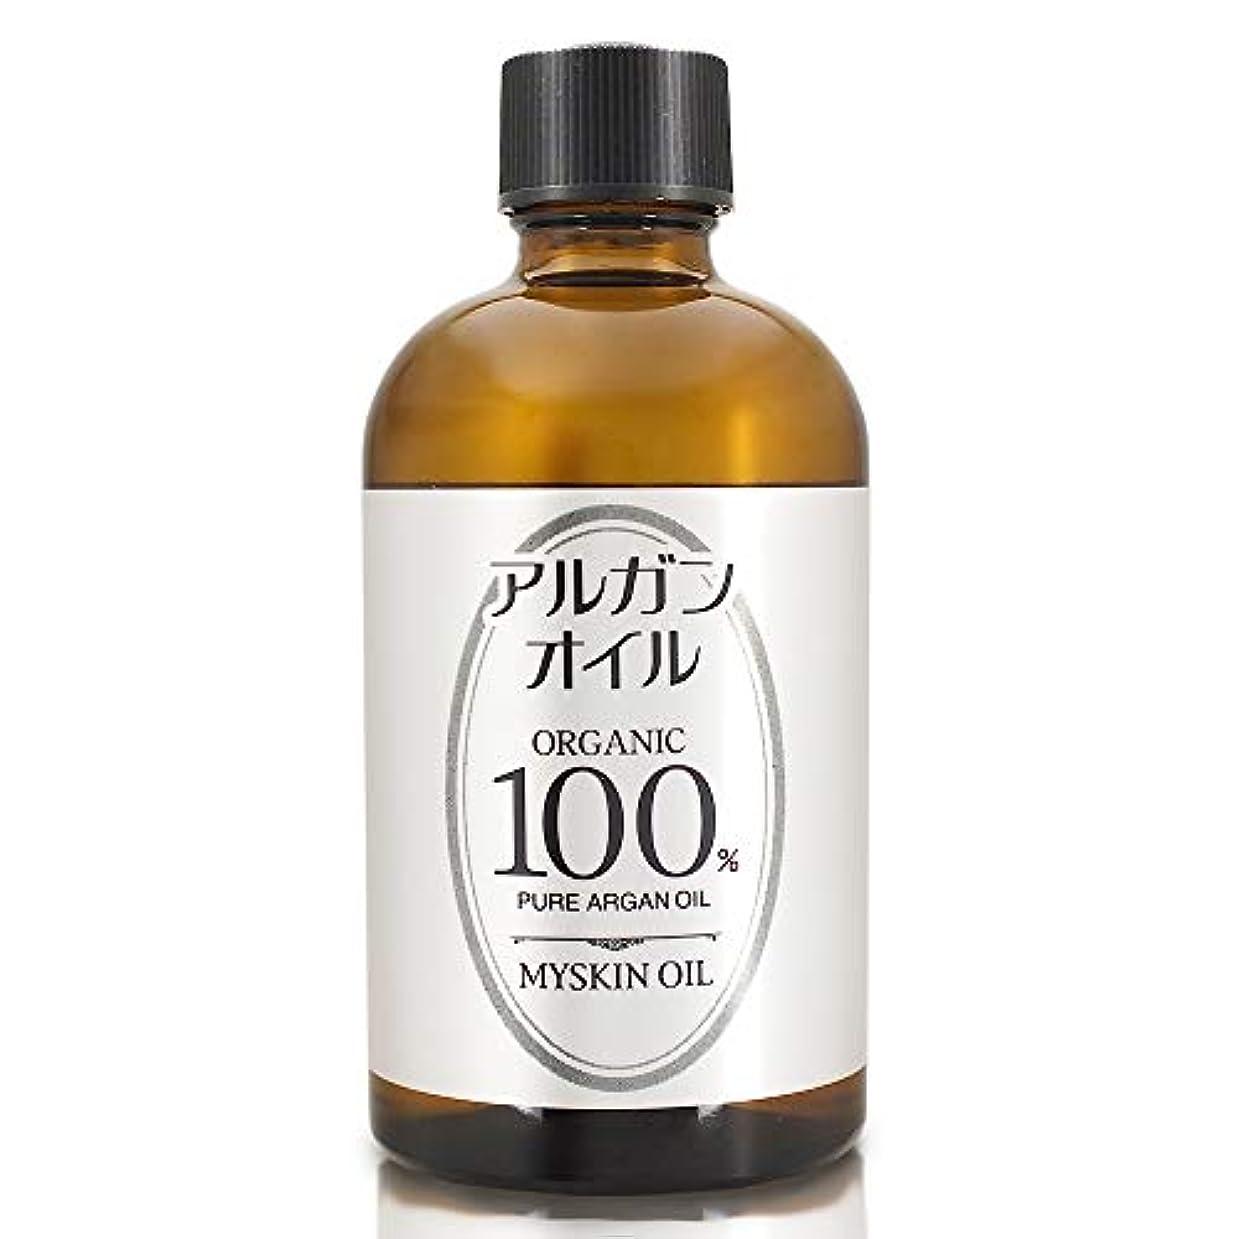 MYSKIN(マイスキン) アルガンオイル 120ml【無添加】